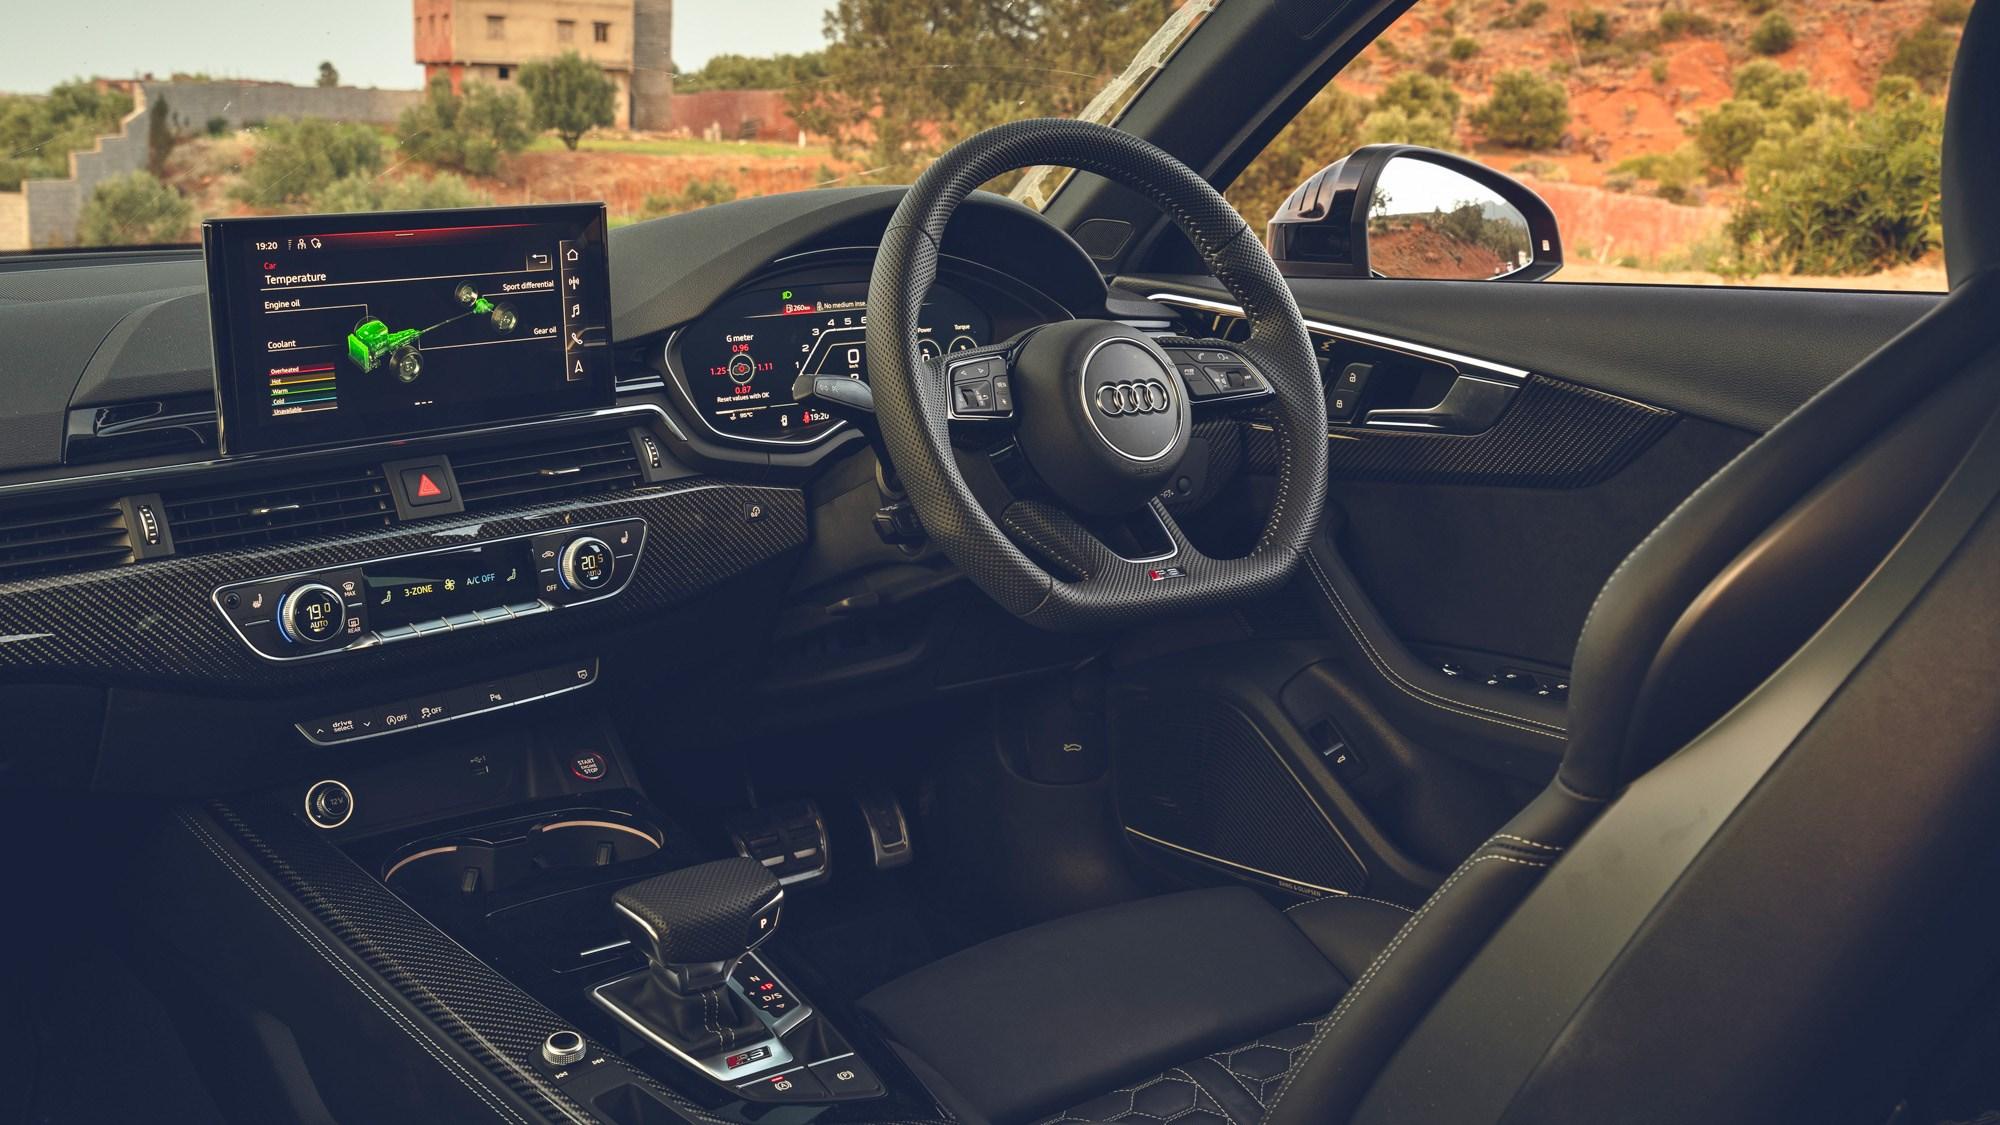 RS4 interior